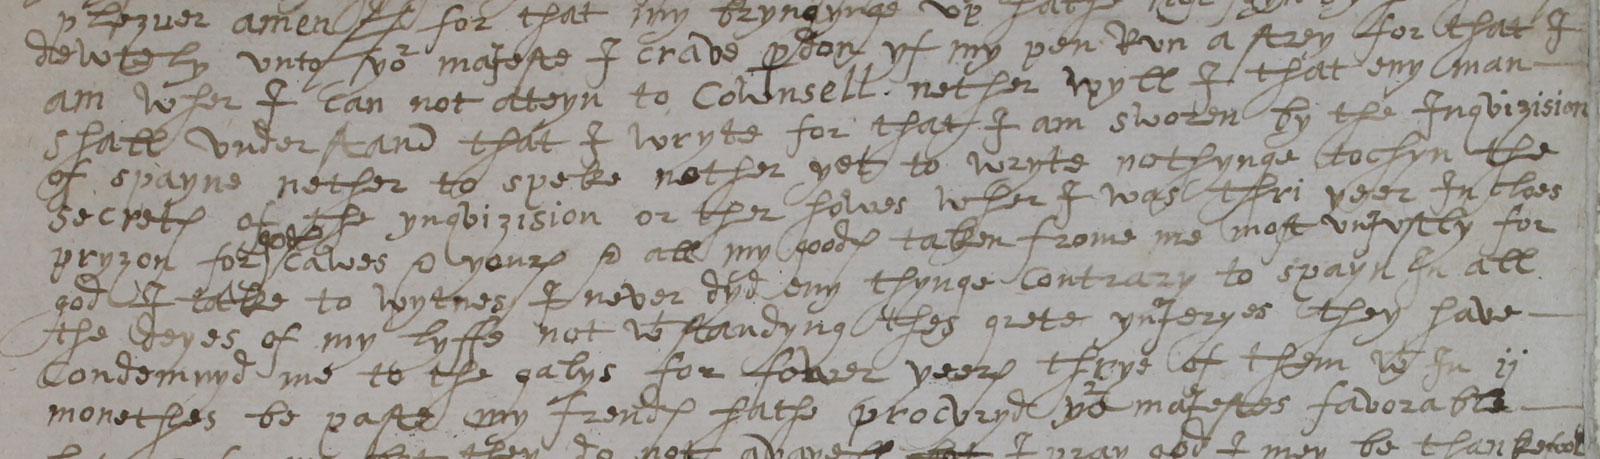 Thomas Cely to Elizabeth, 12 December 1579 (SP 94.1 f.89)